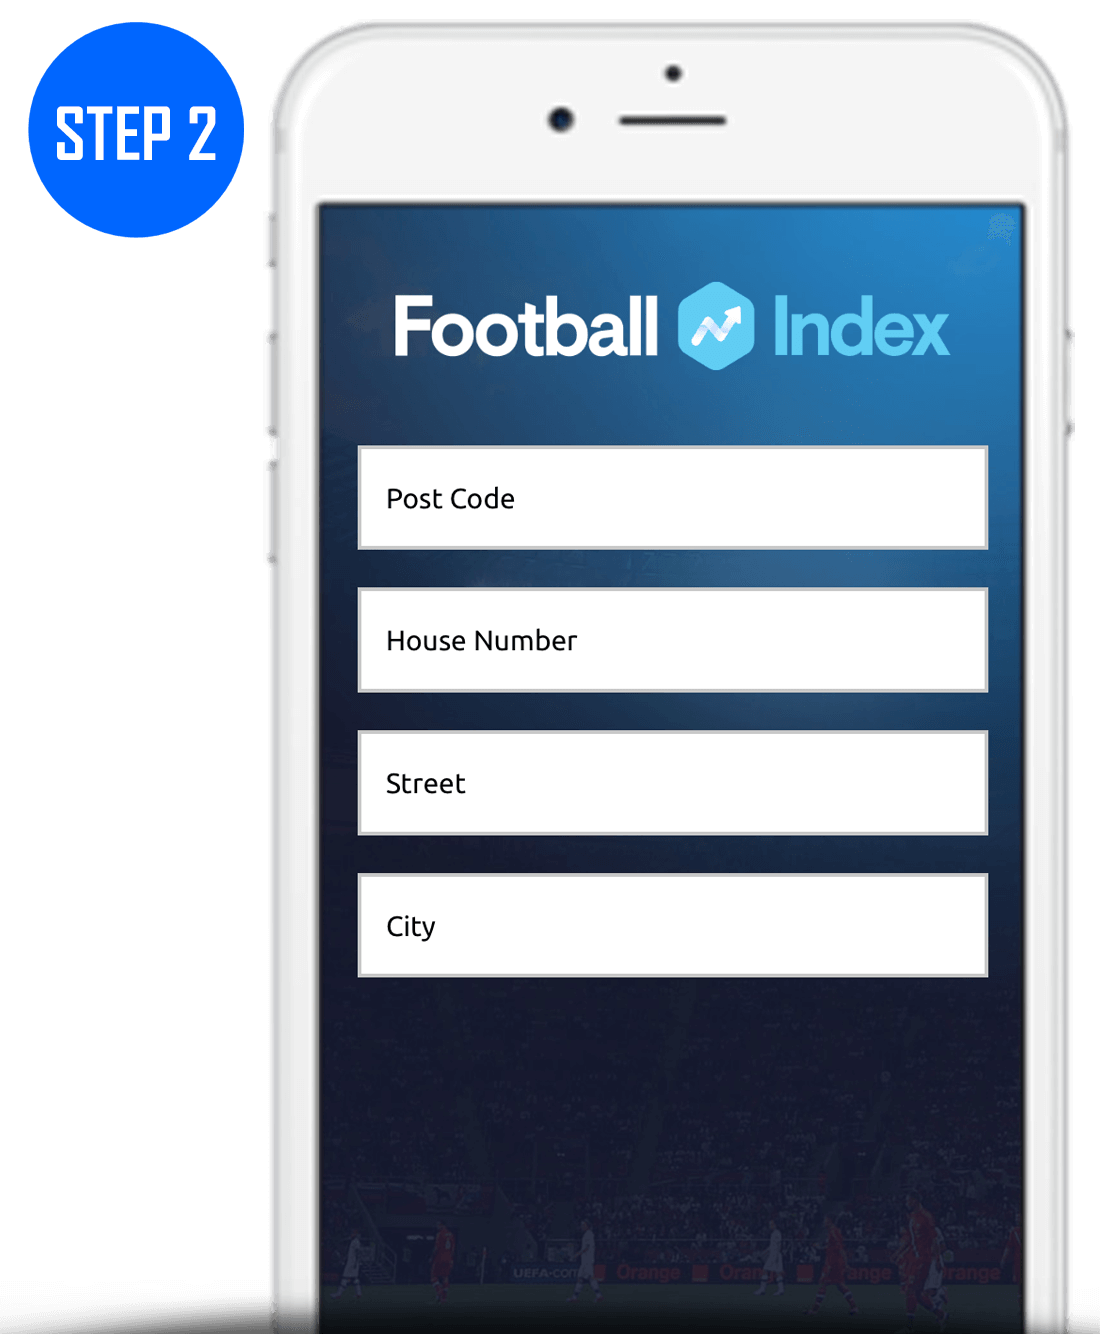 Football Index Sign Up Process Step 2